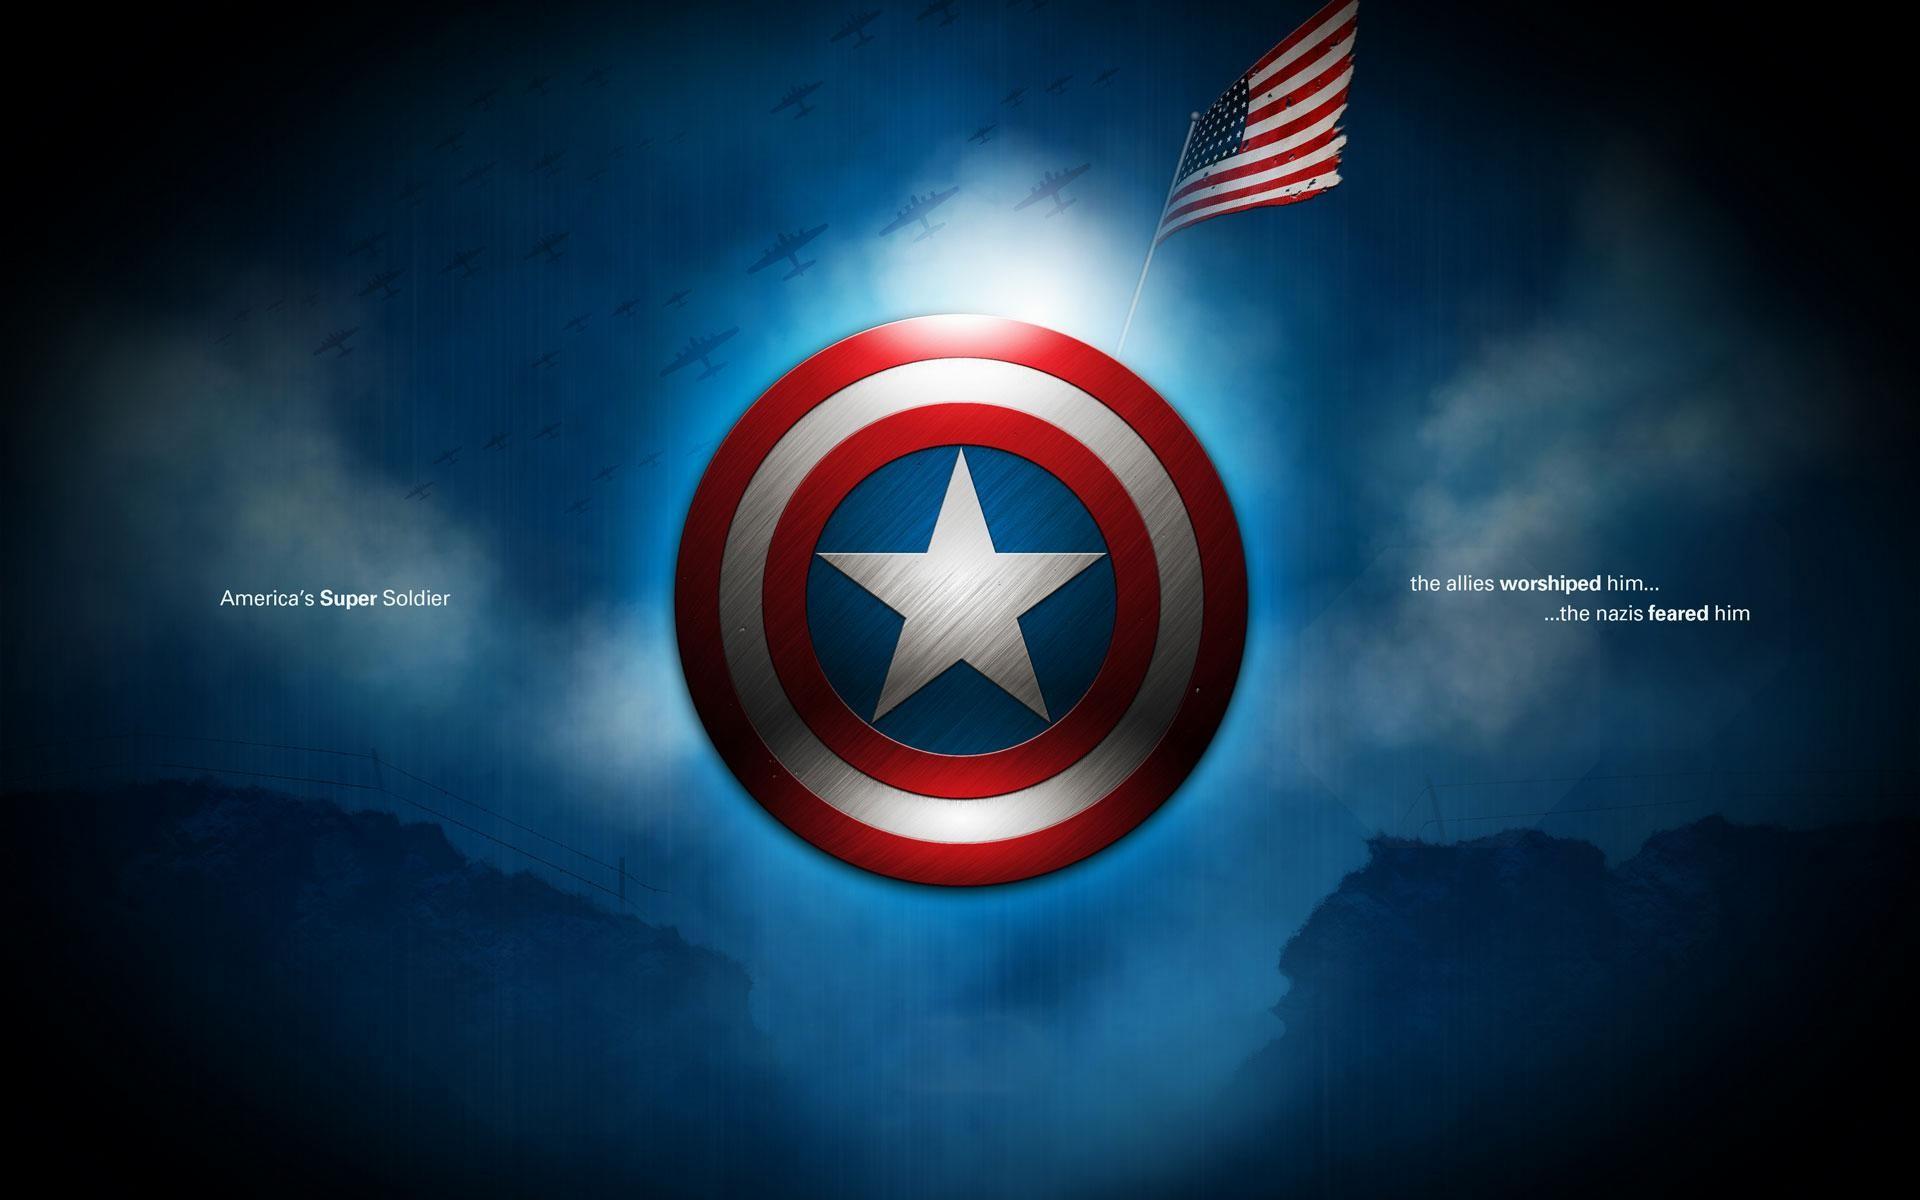 wallpaper.wiki-HD-Captain-America-Shield-Backgrounds-PIC-